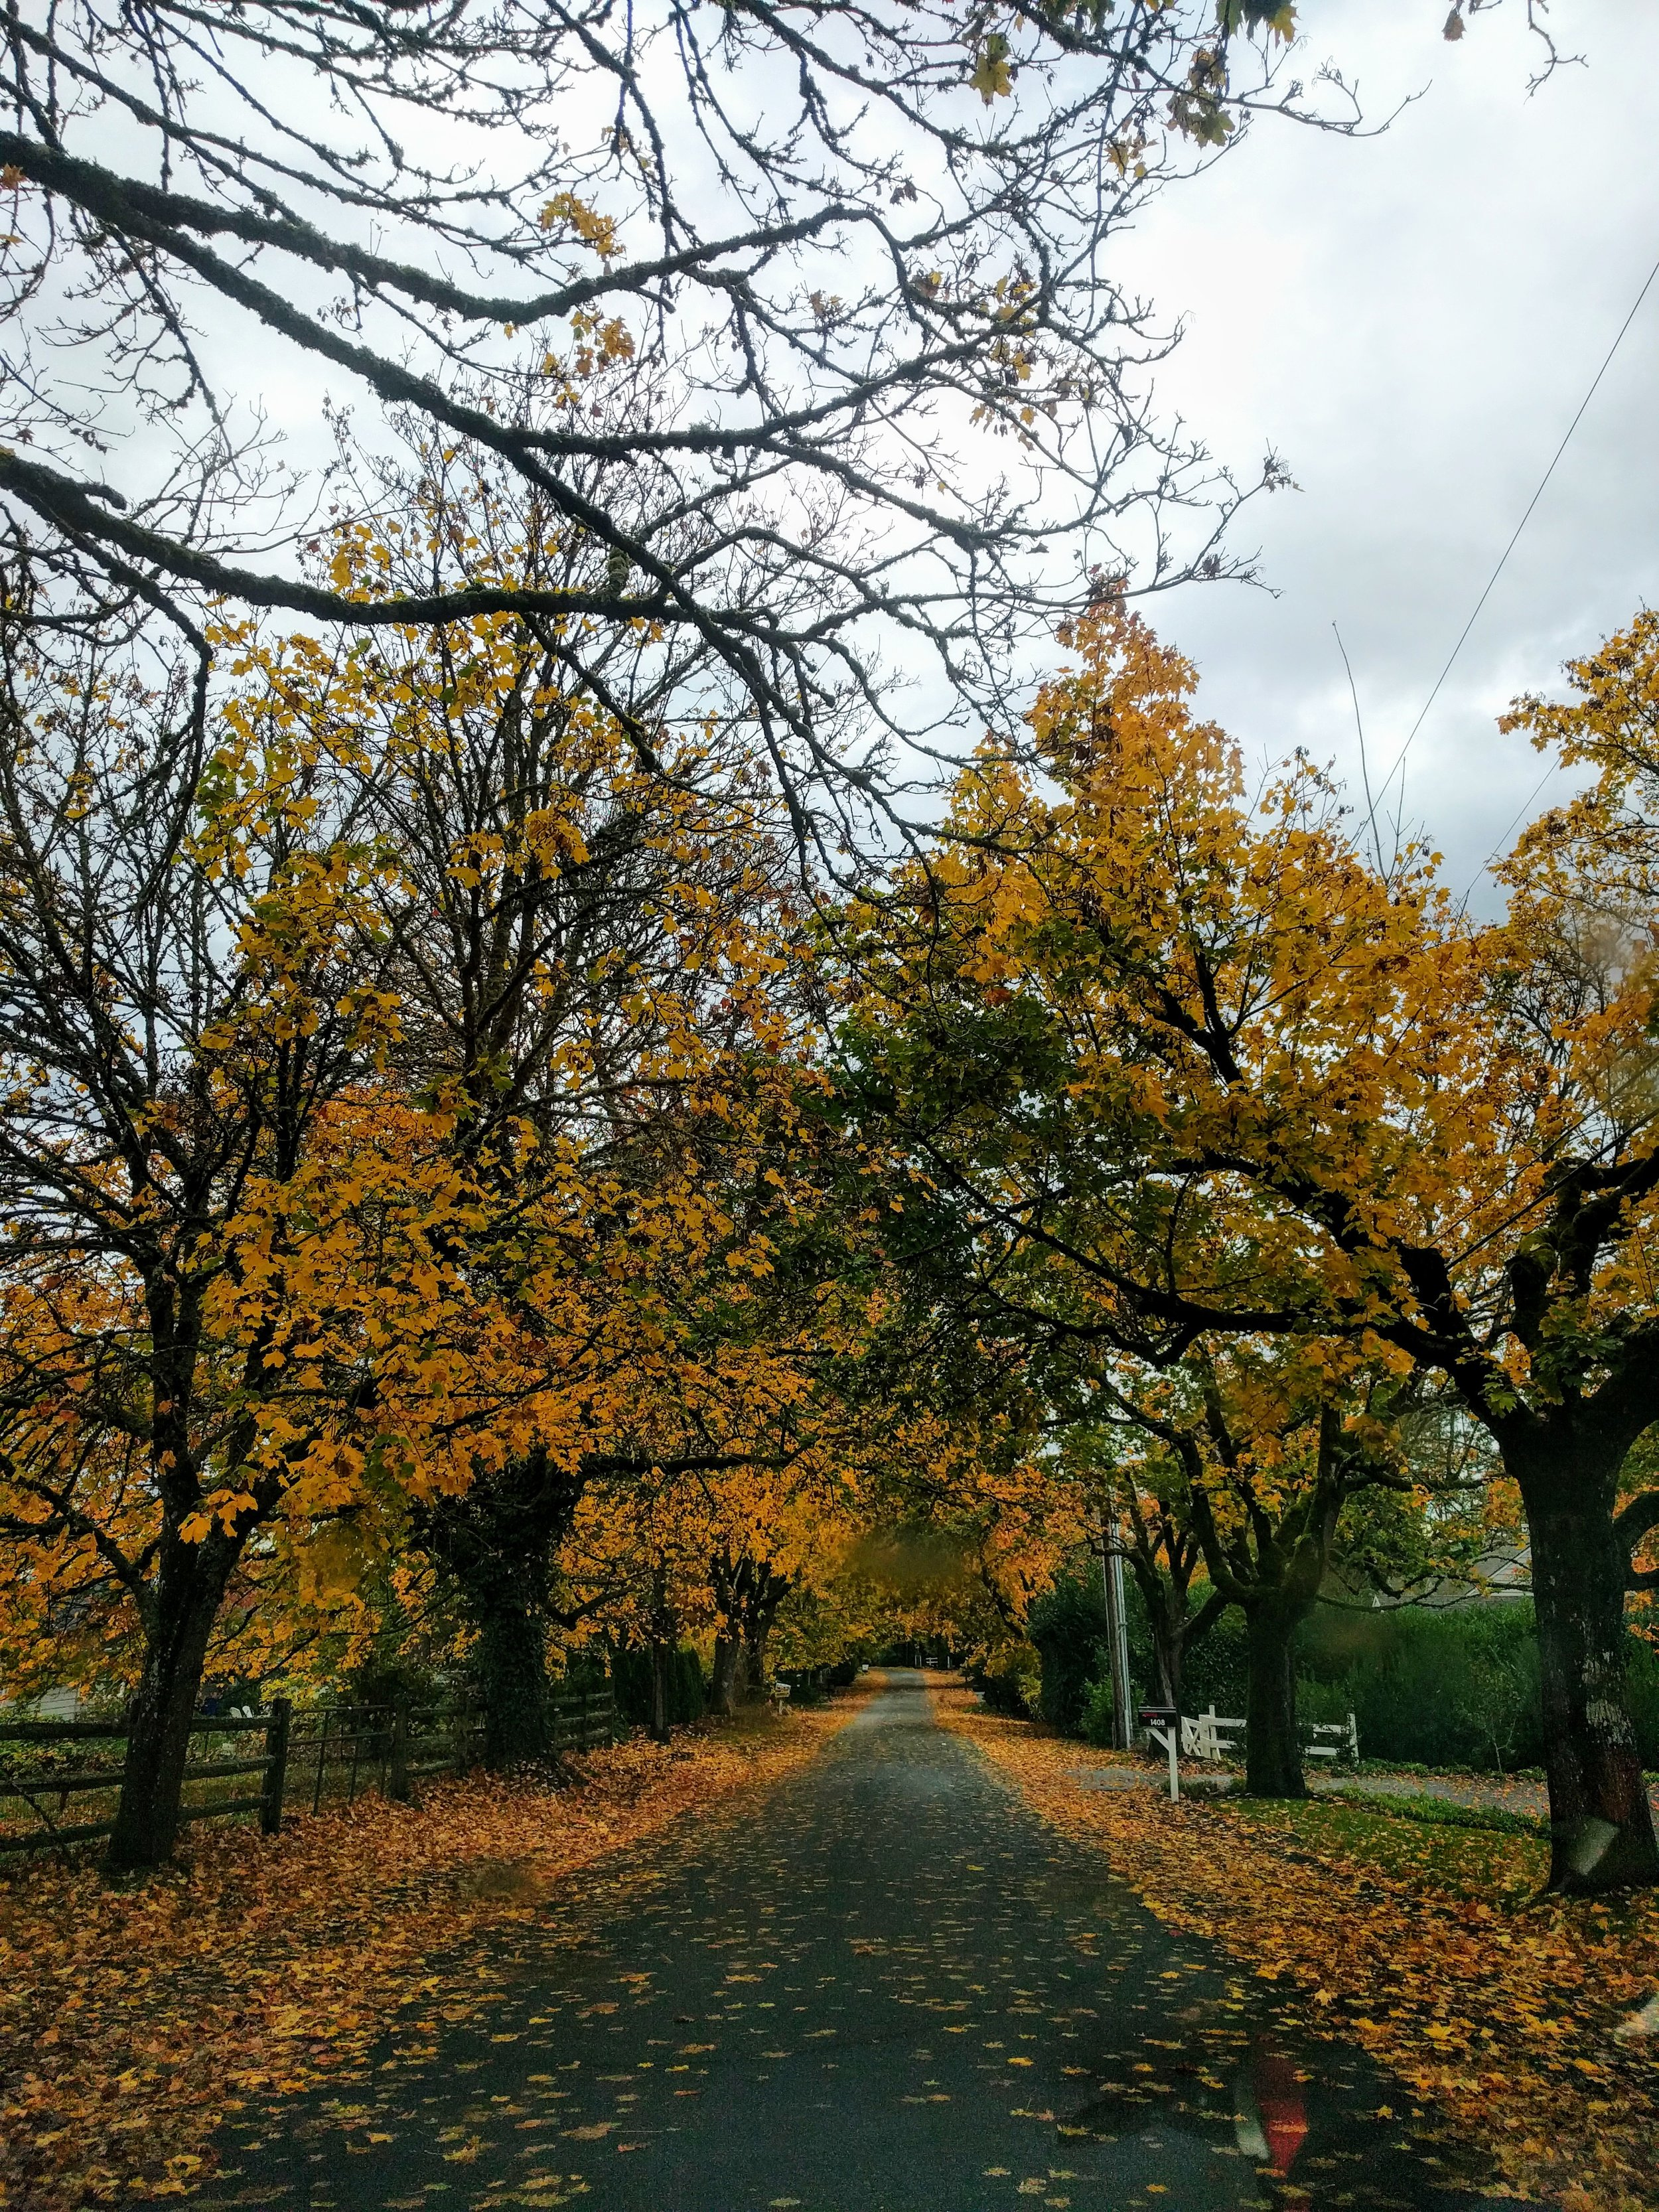 Personal Autumn